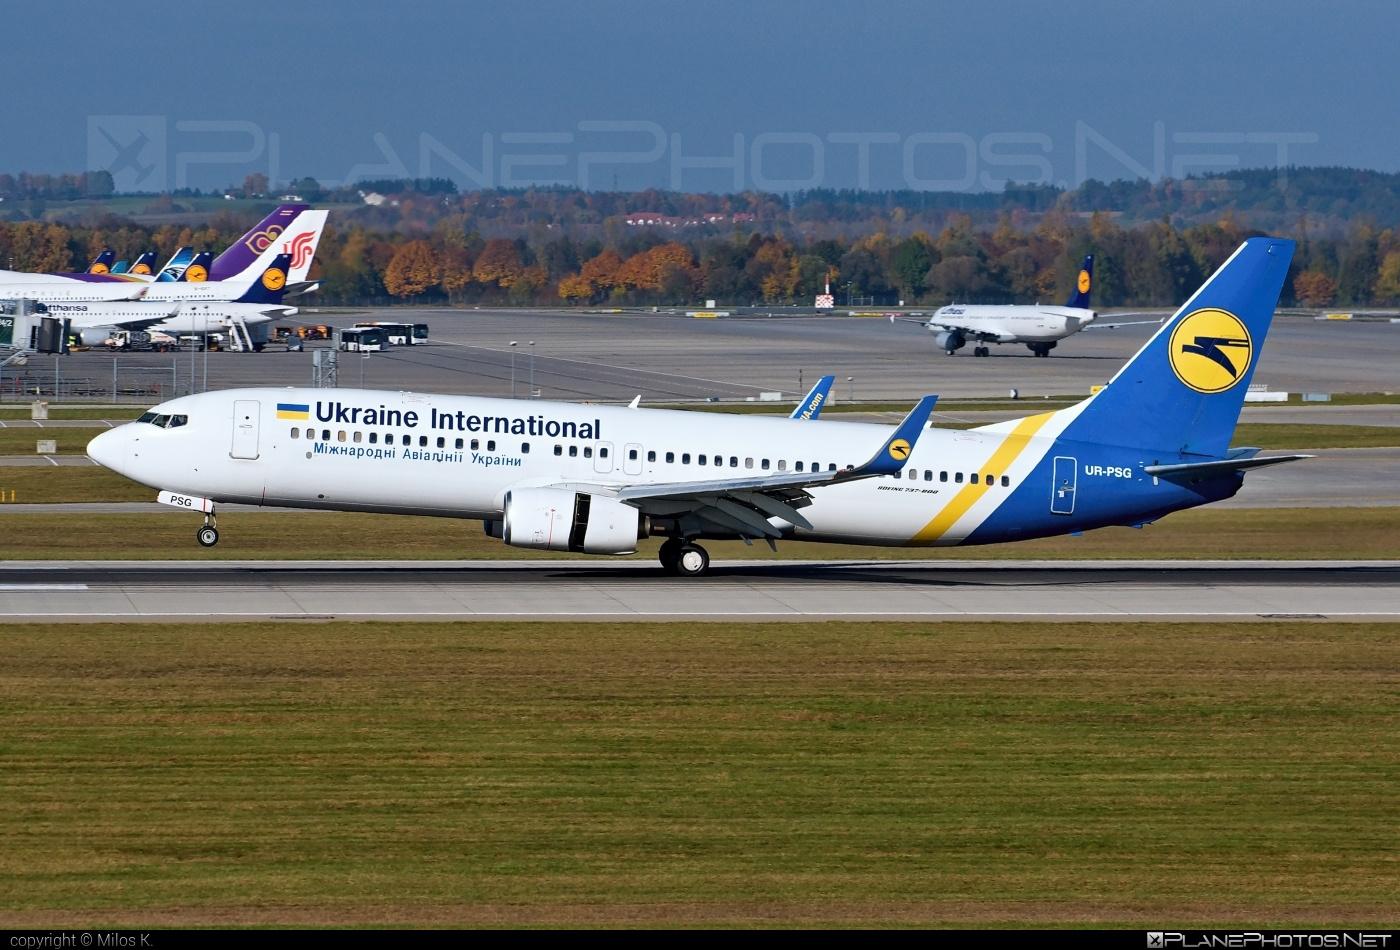 Boeing 737-800 - UR-PSG operated by Ukraine International Airlines #b737 #b737nextgen #b737ng #boeing #boeing737 #uia #ukraineinternationalairlines